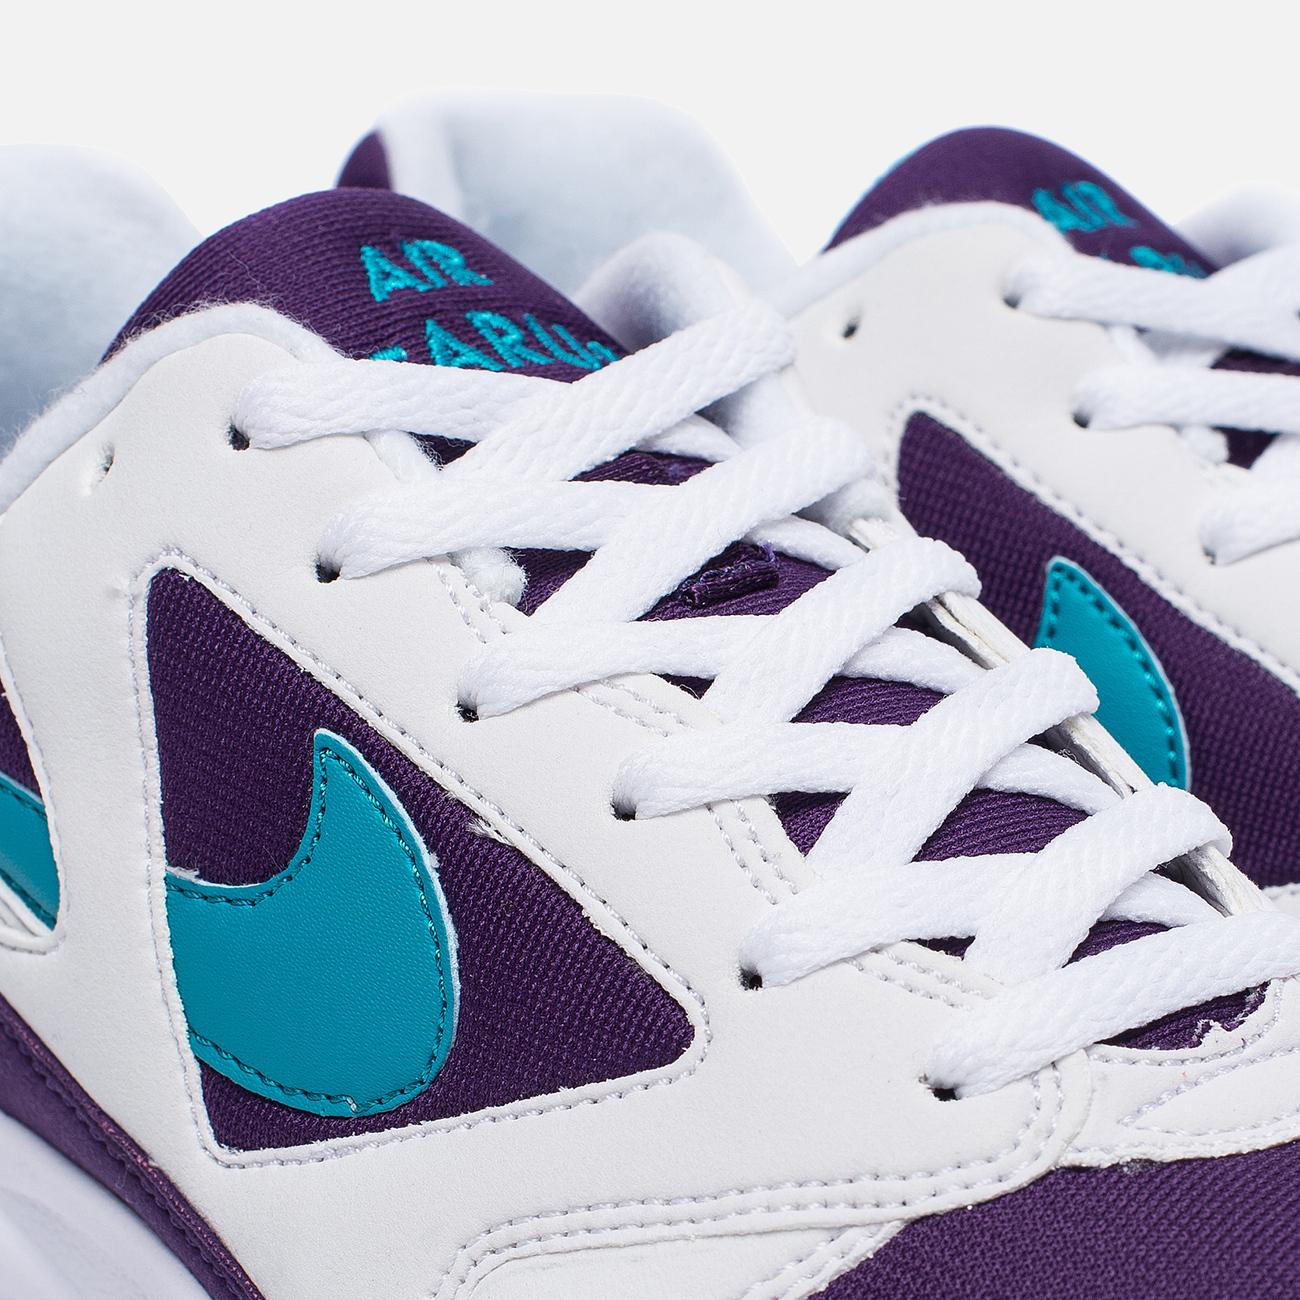 Мужские кроссовки Nike Air Icarus Extra 875842 500